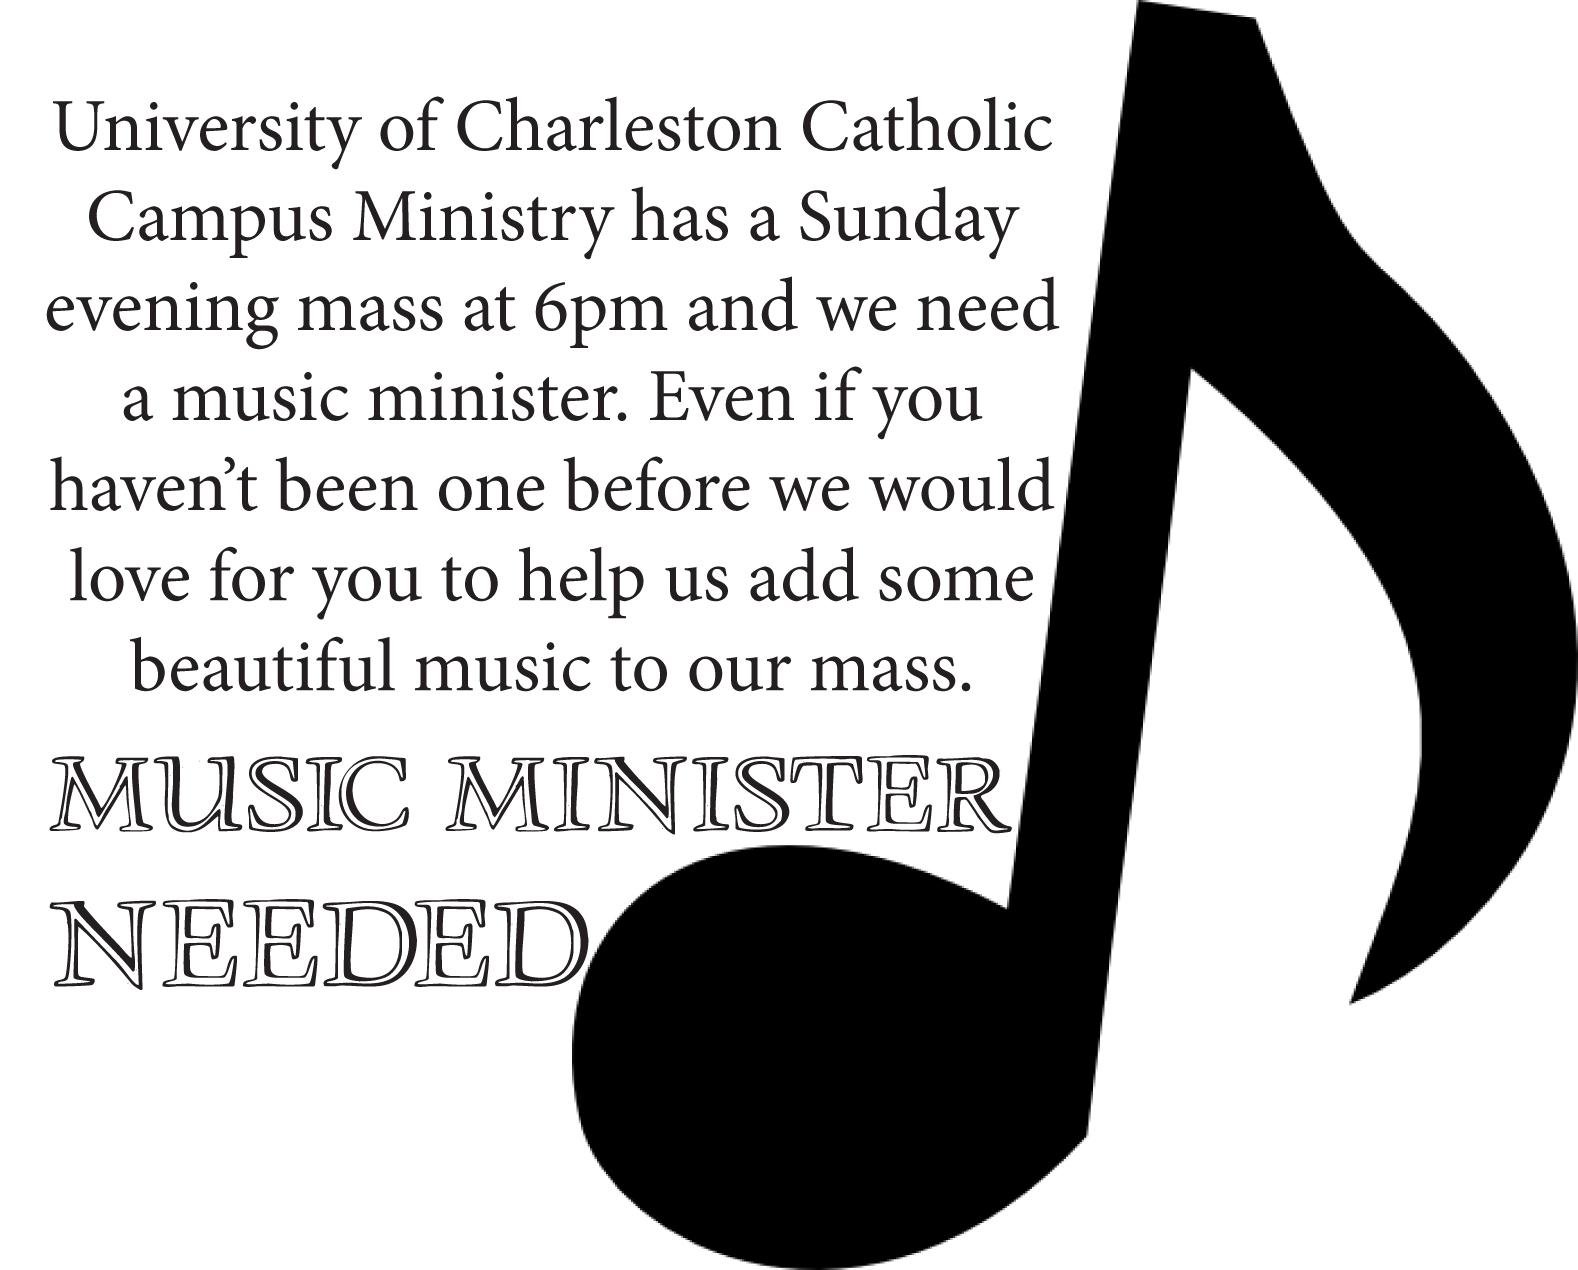 music minister